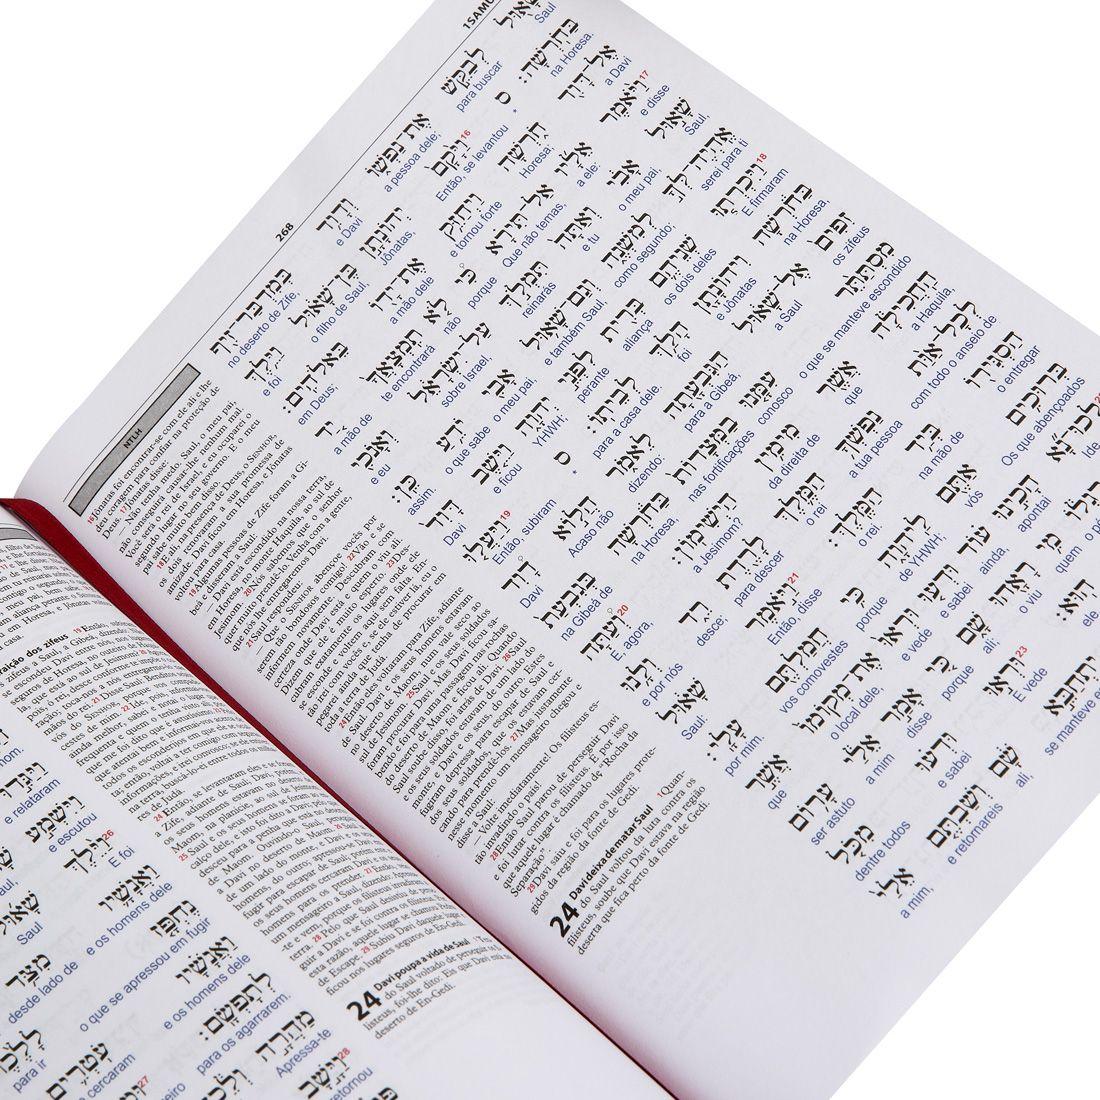 Antigo Testamento Interlinear Hebraico-Português Vol. 3 - Profetas Posteriores